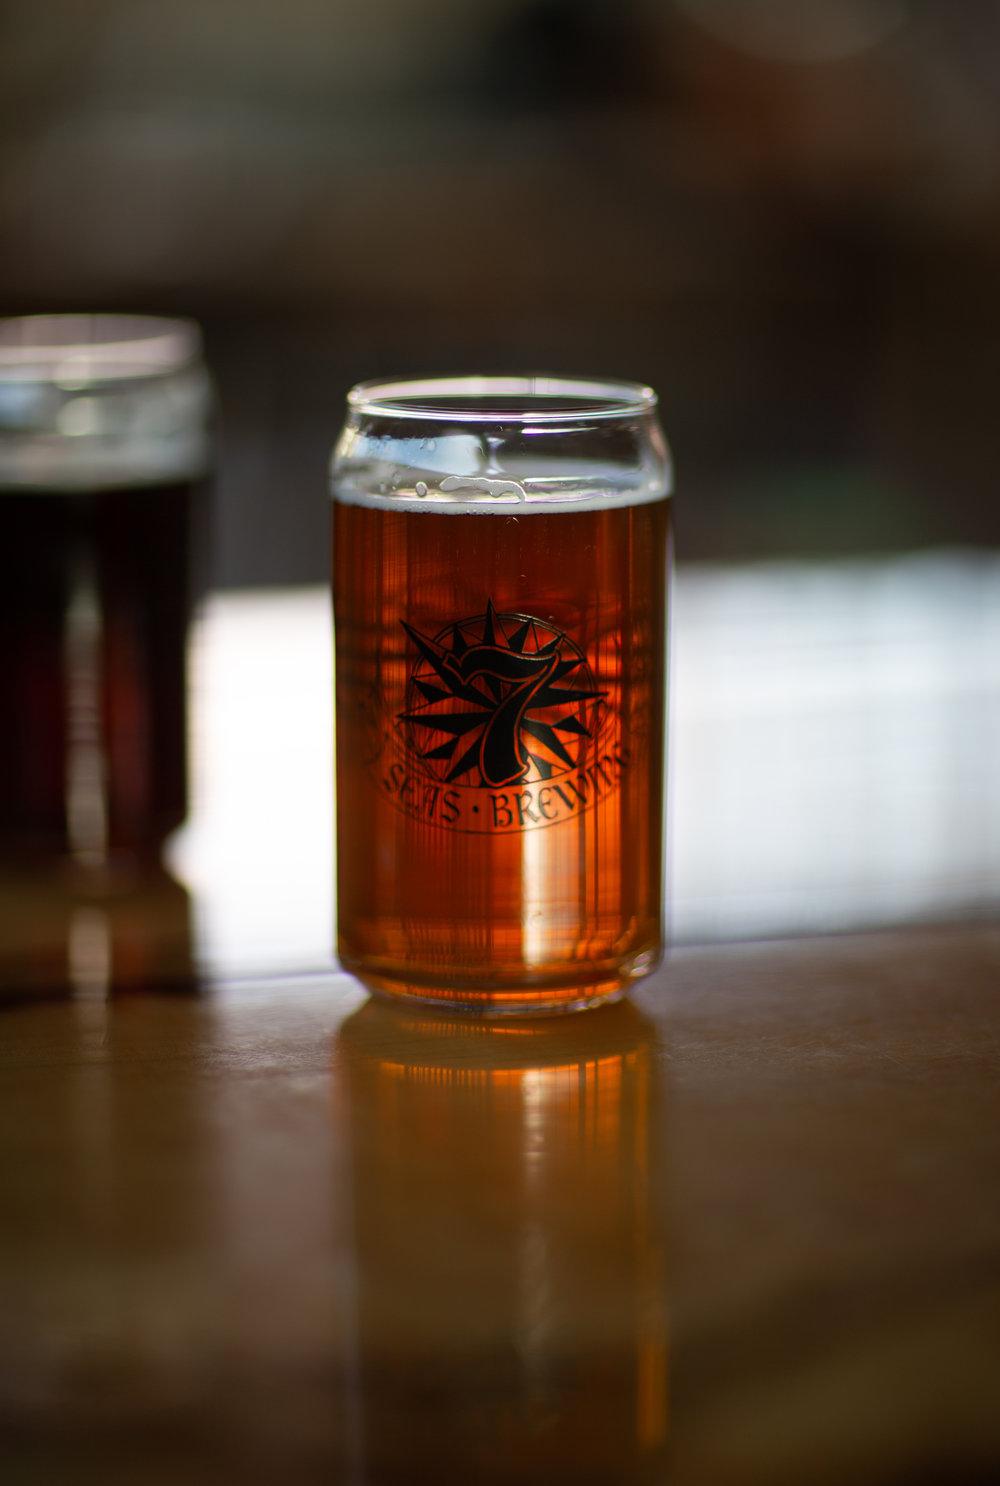 7 Seas Brewery